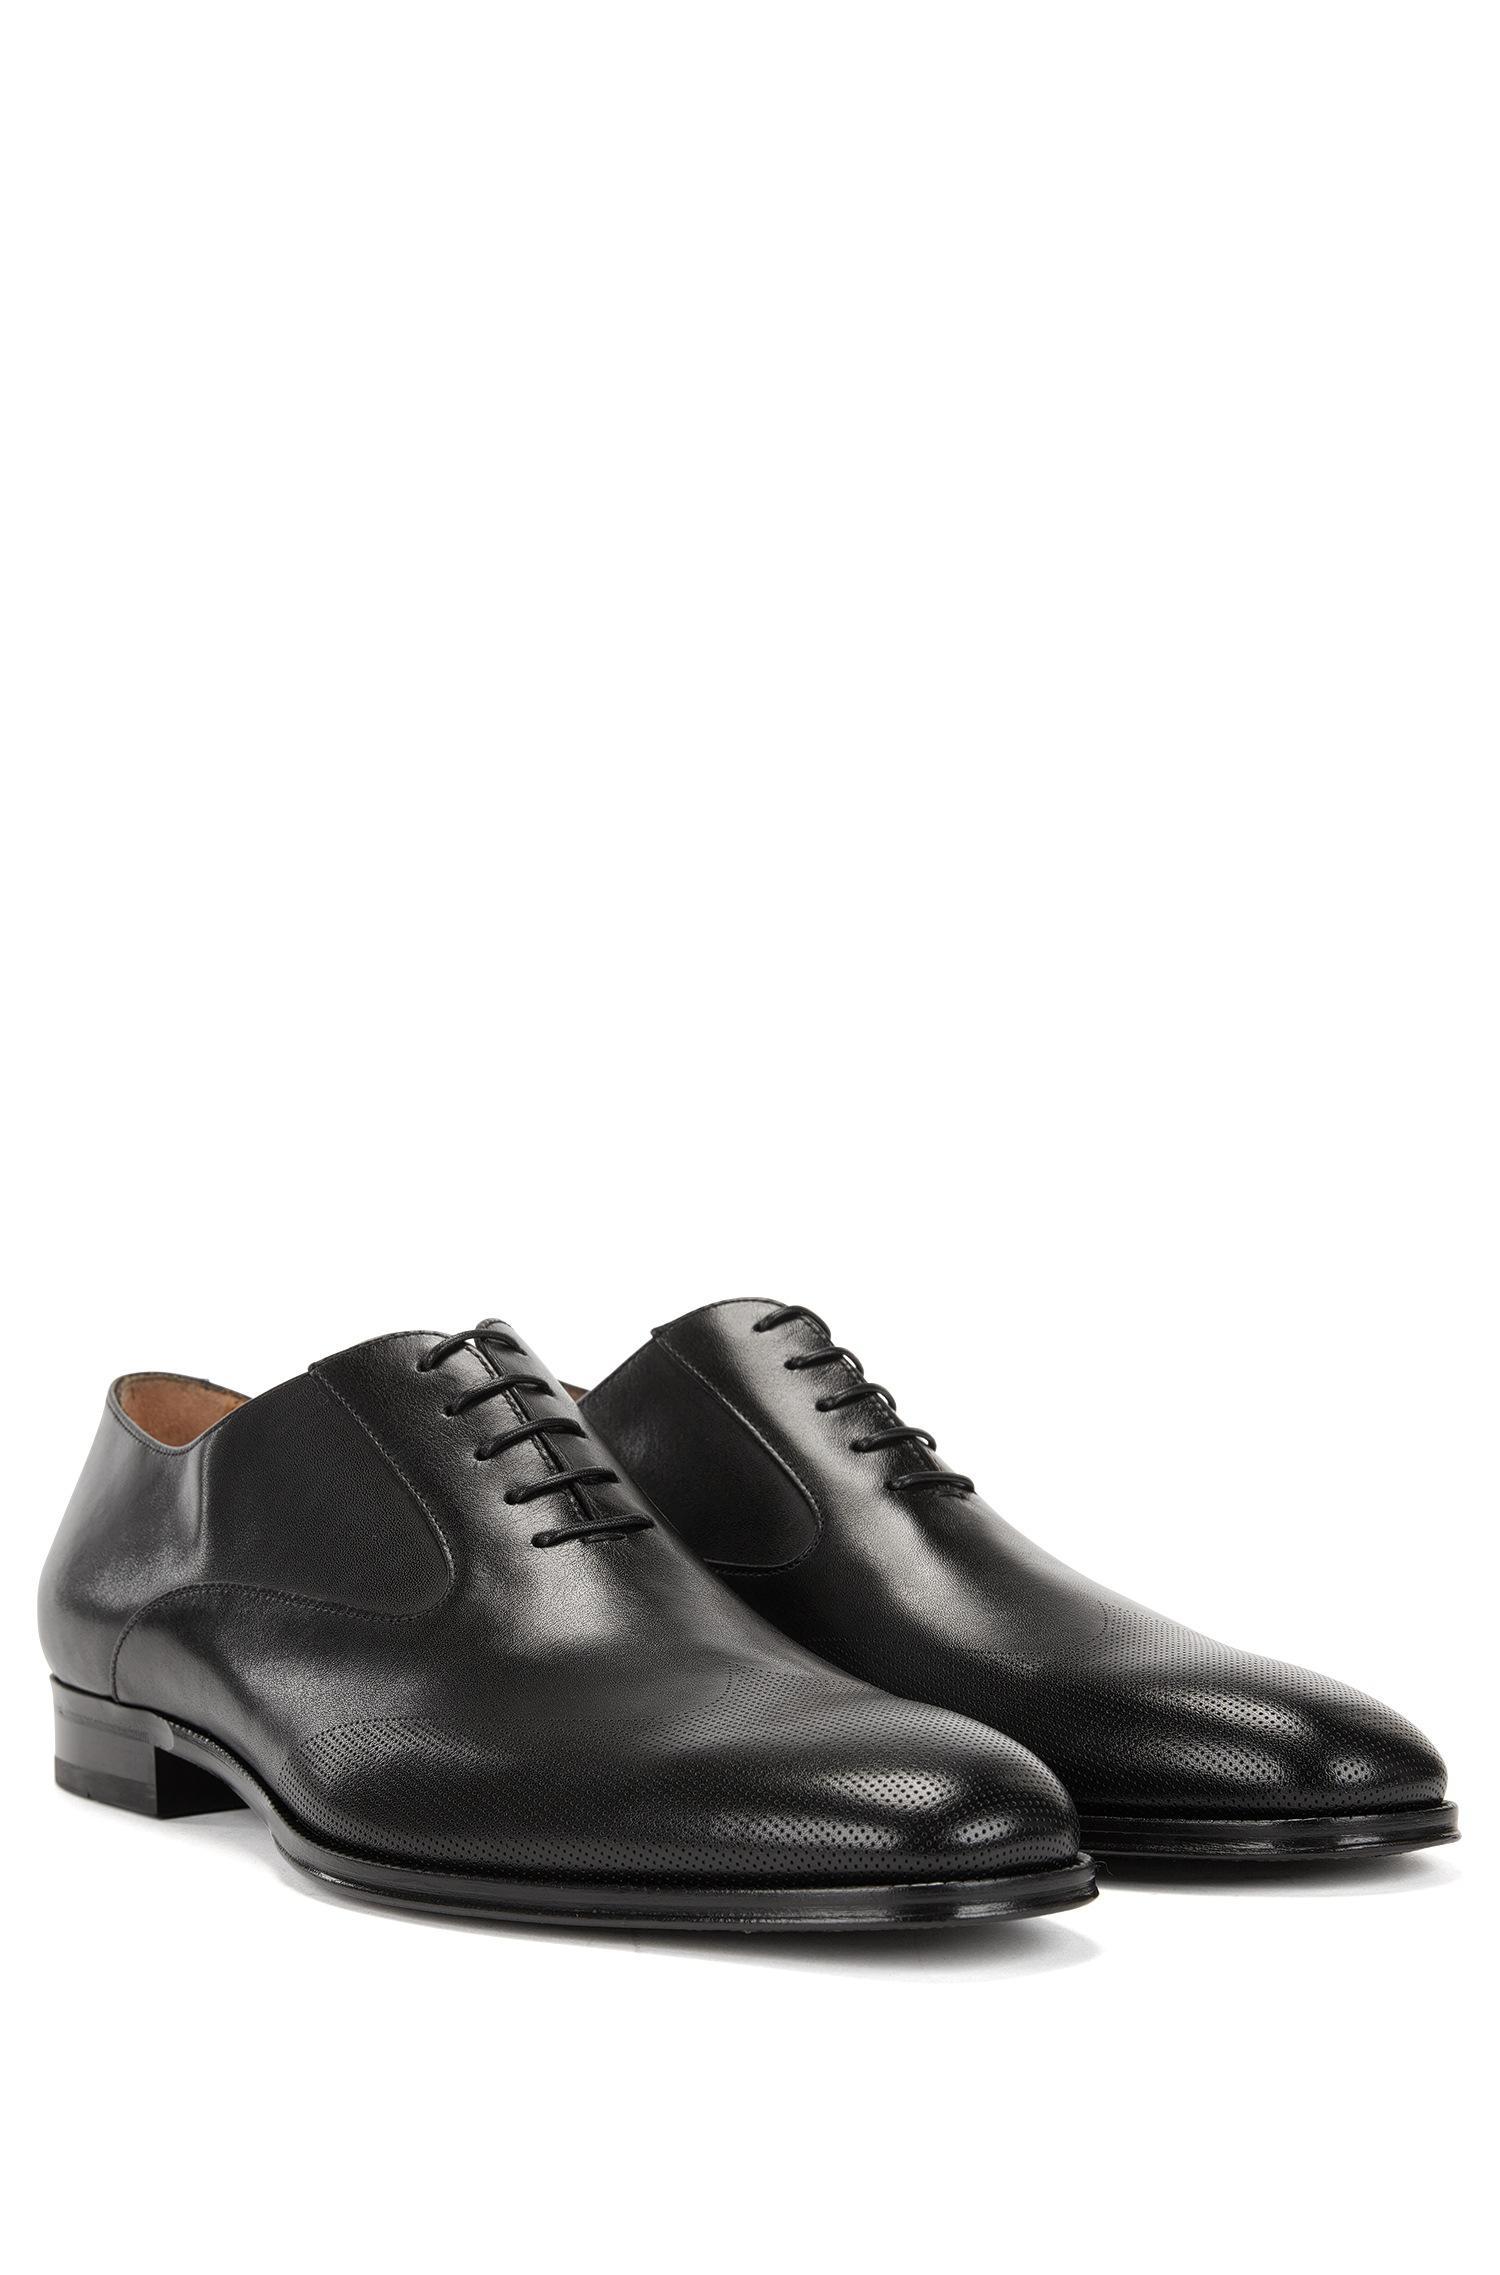 Italian-made loafers in burnished calf leather BOSS CWtWJEU9sI